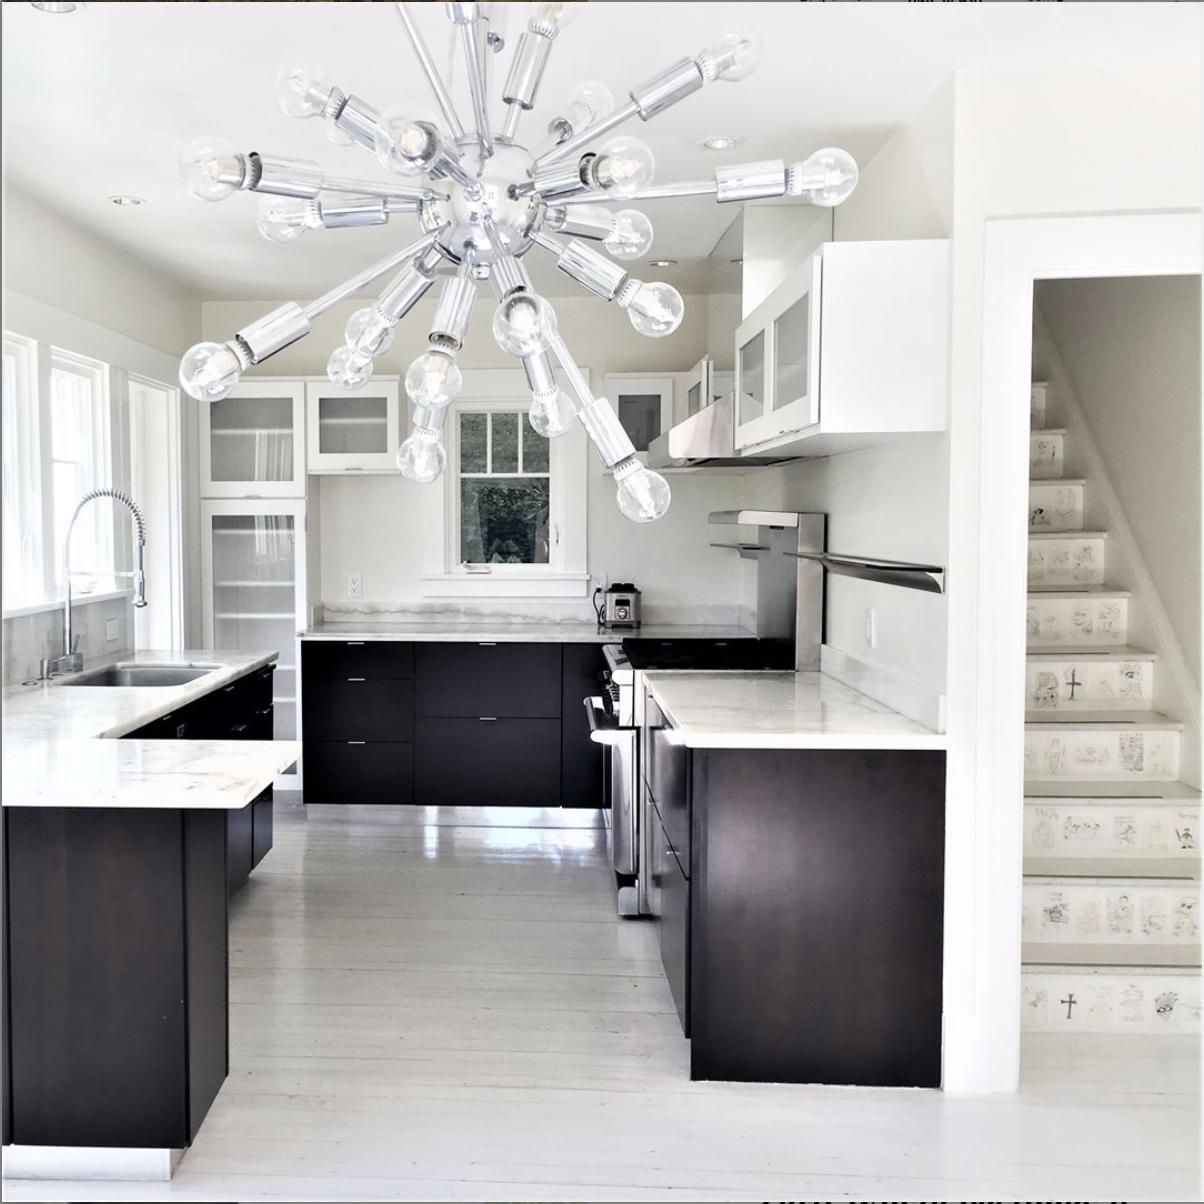 zero waste kitchen bea johnson with images zero waste kitchen home house on zero waste kitchen interior id=66499